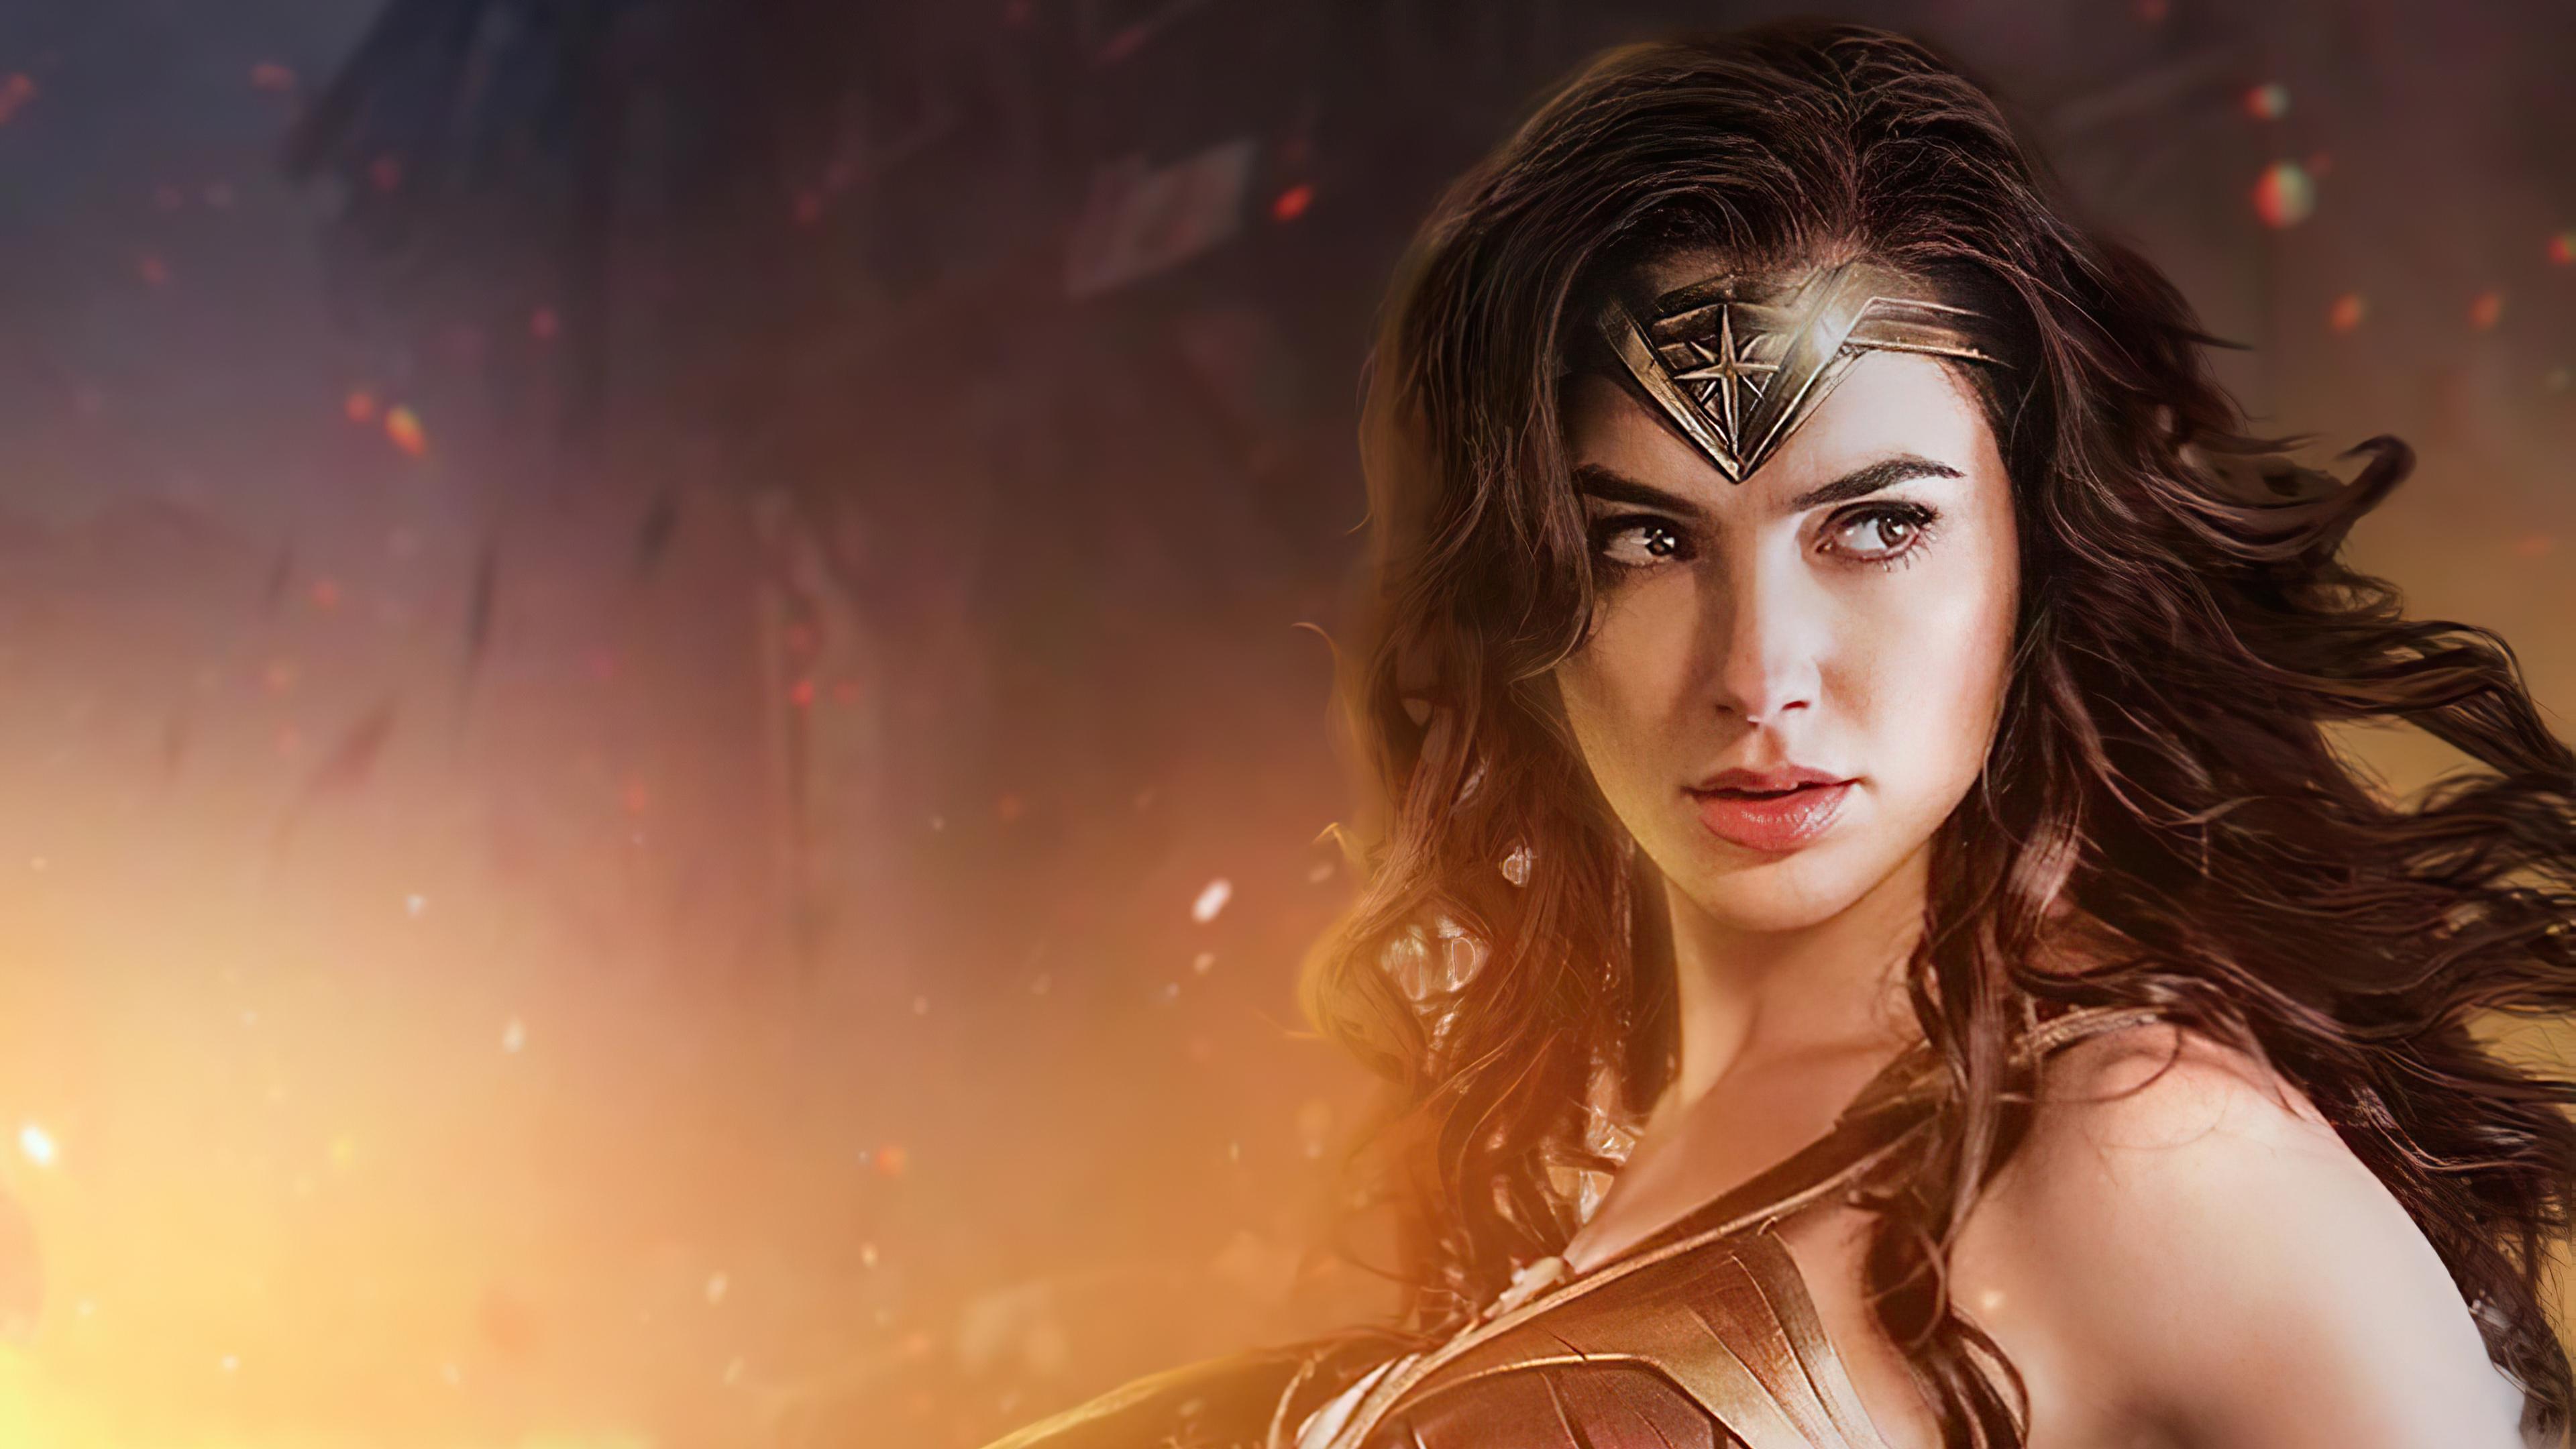 Gal Gadot Wonder Woman 3840x2160 Download Hd Wallpaper Wallpapertip